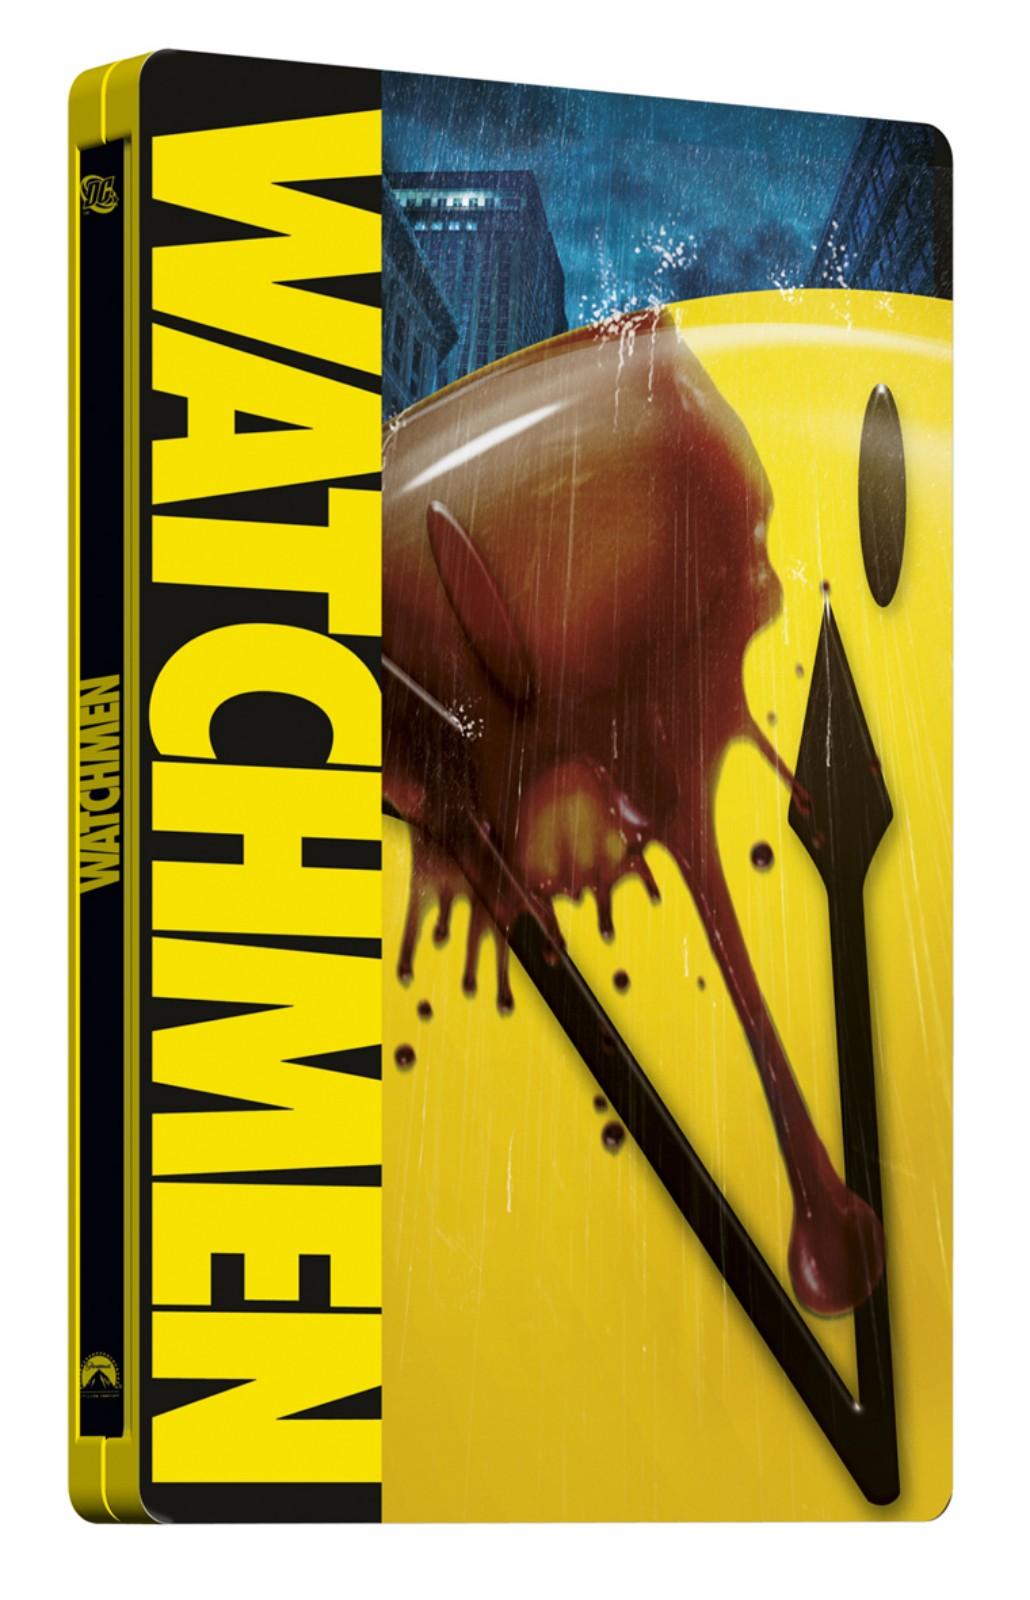 watchmen-les-gardiens-film-volume-collector-4759